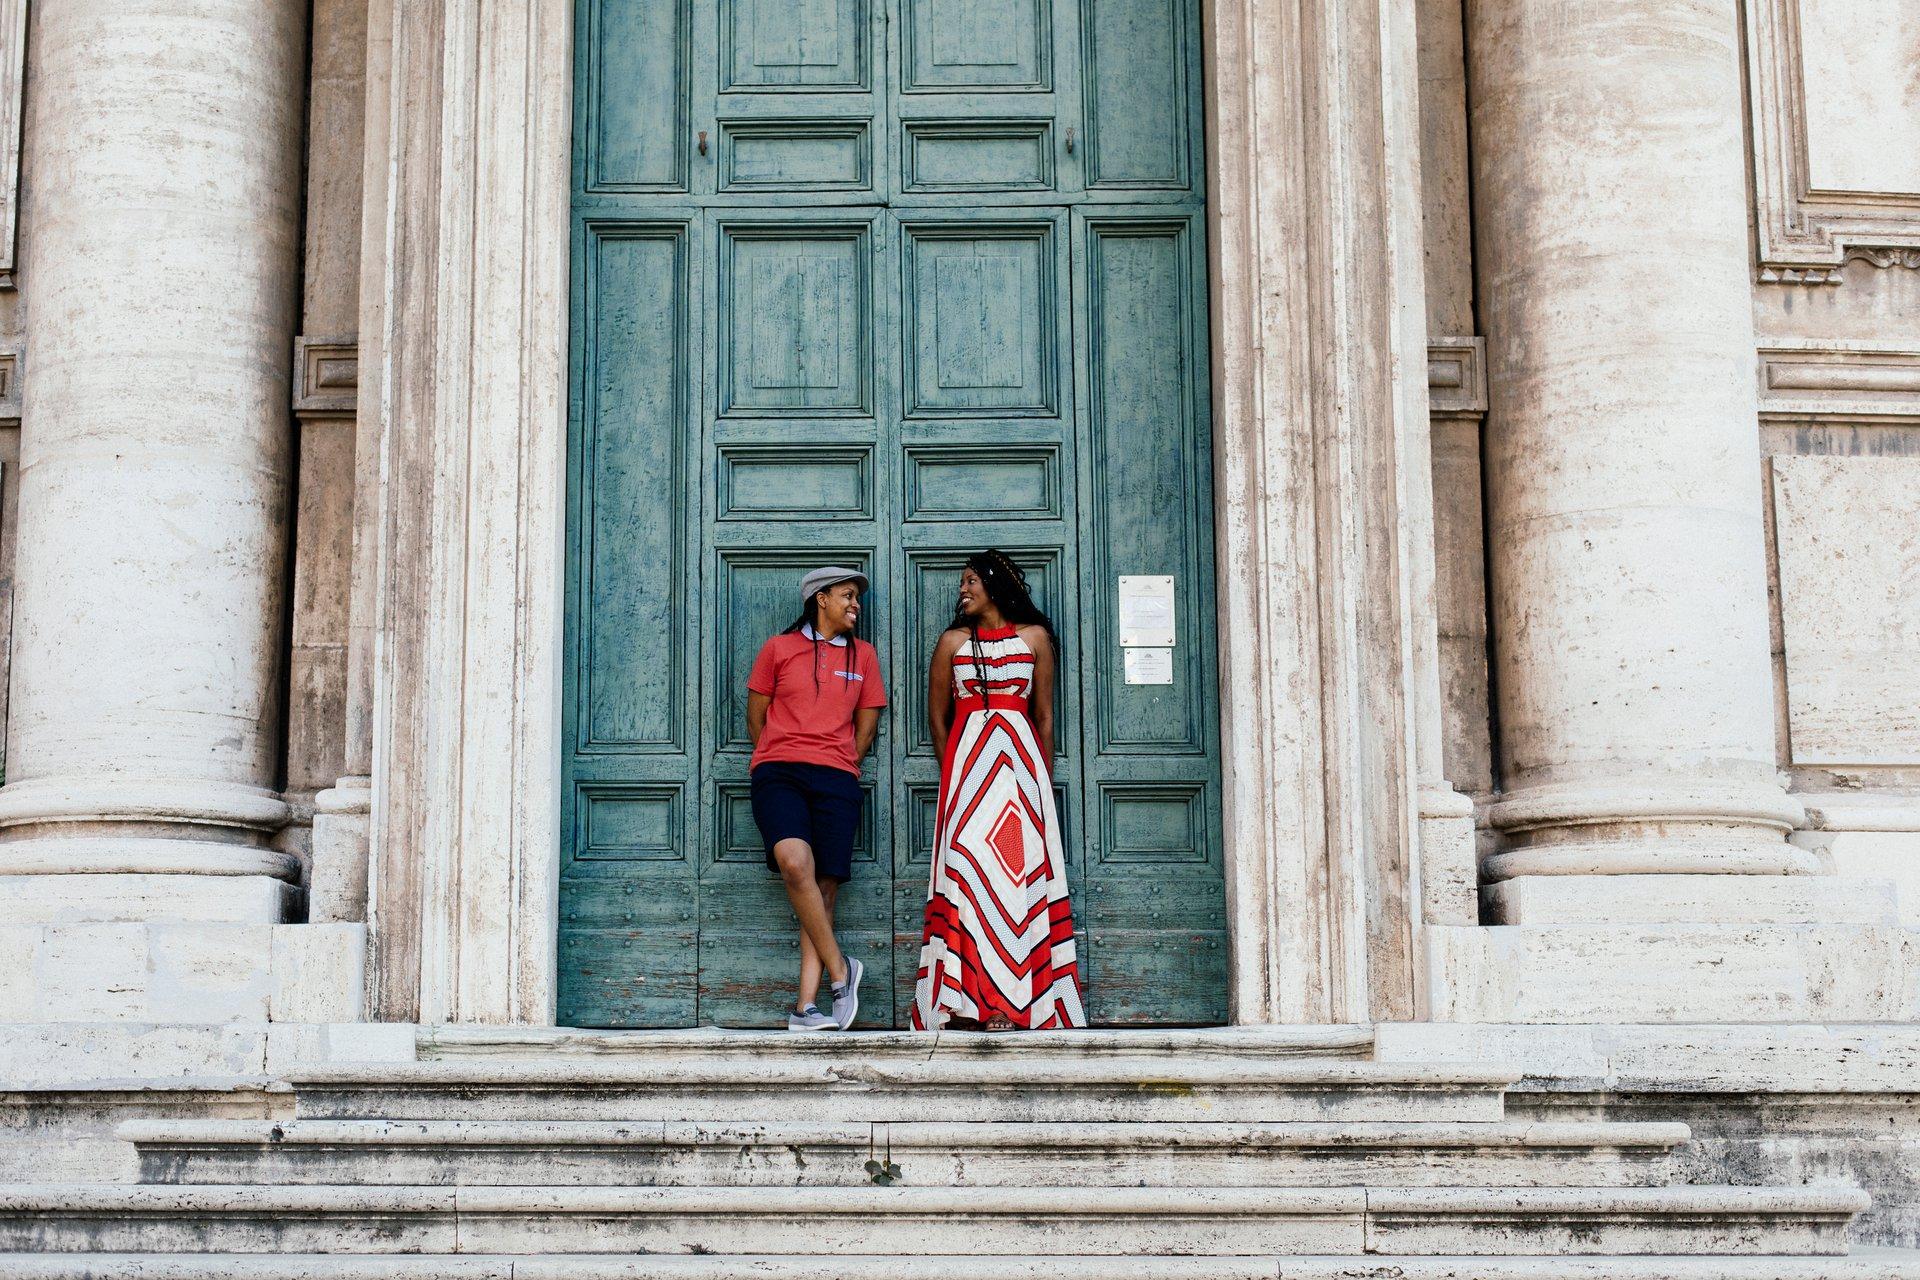 Rome-Italy-travel-story-Flytographer-32